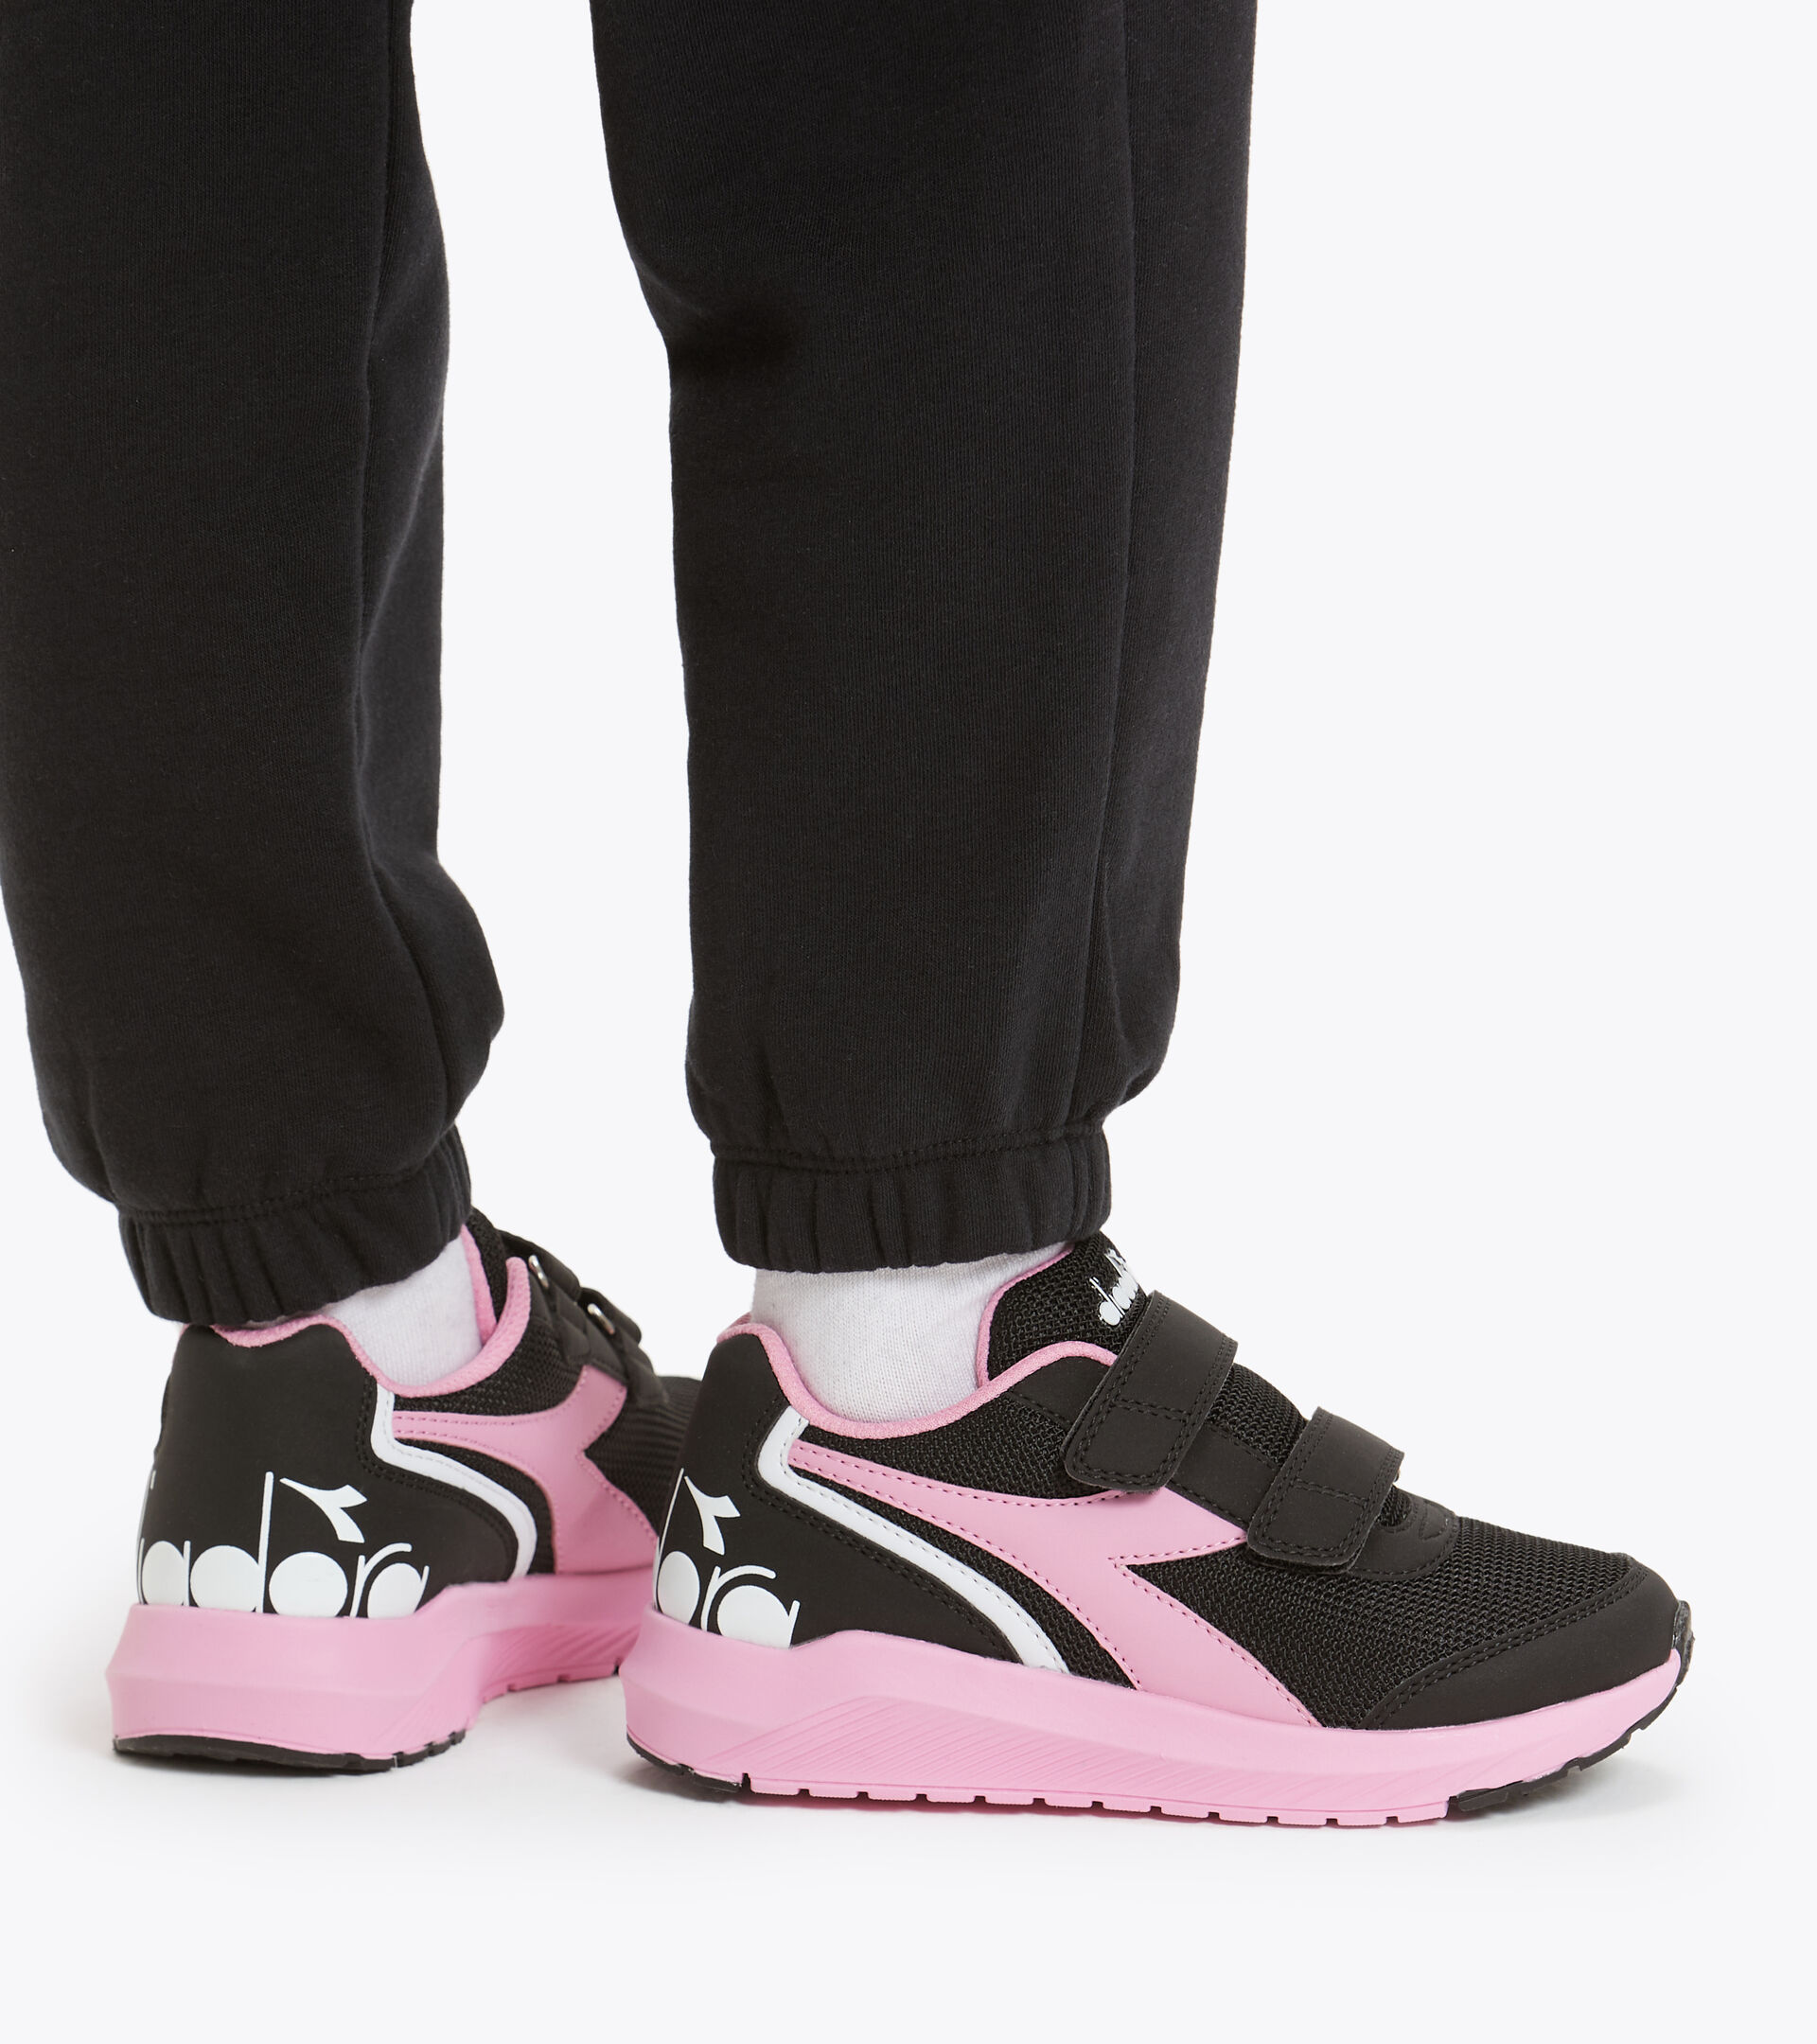 Zapatilla de running - Unisex niños FALCON JR V NEGRO/ROSA BEGONIA - Diadora